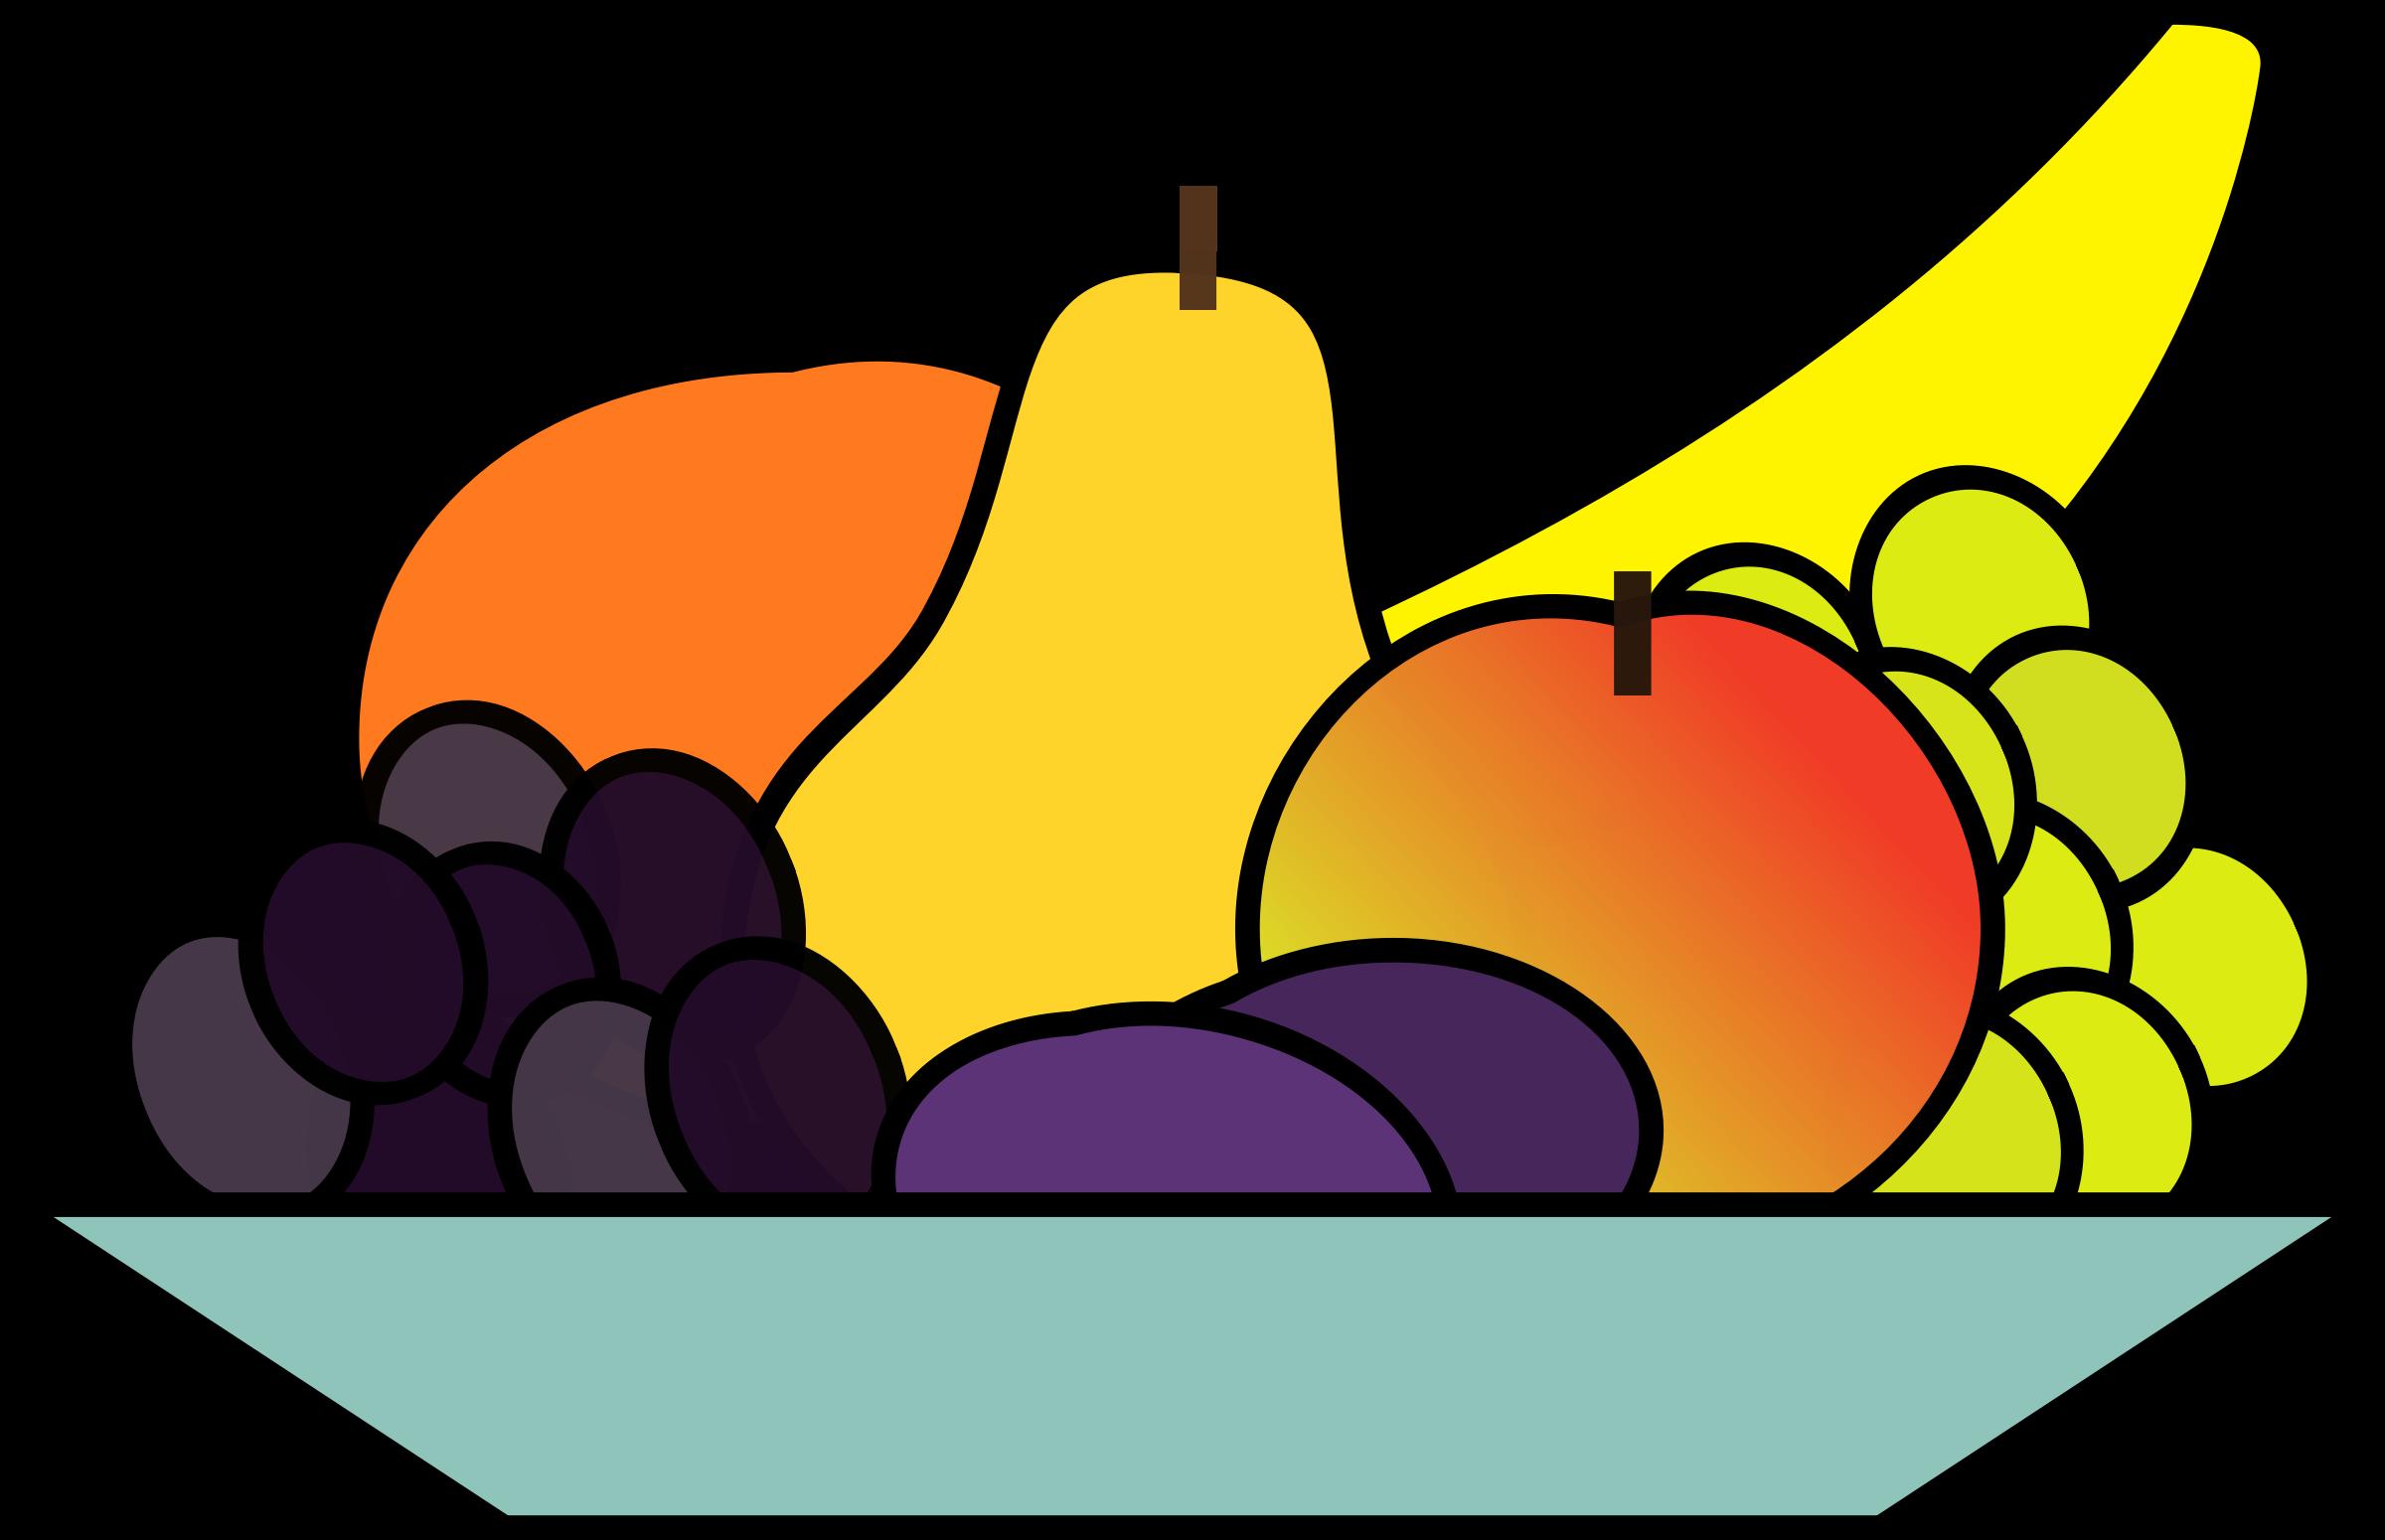 2400x1550 Top 81 Fruit Clip Art